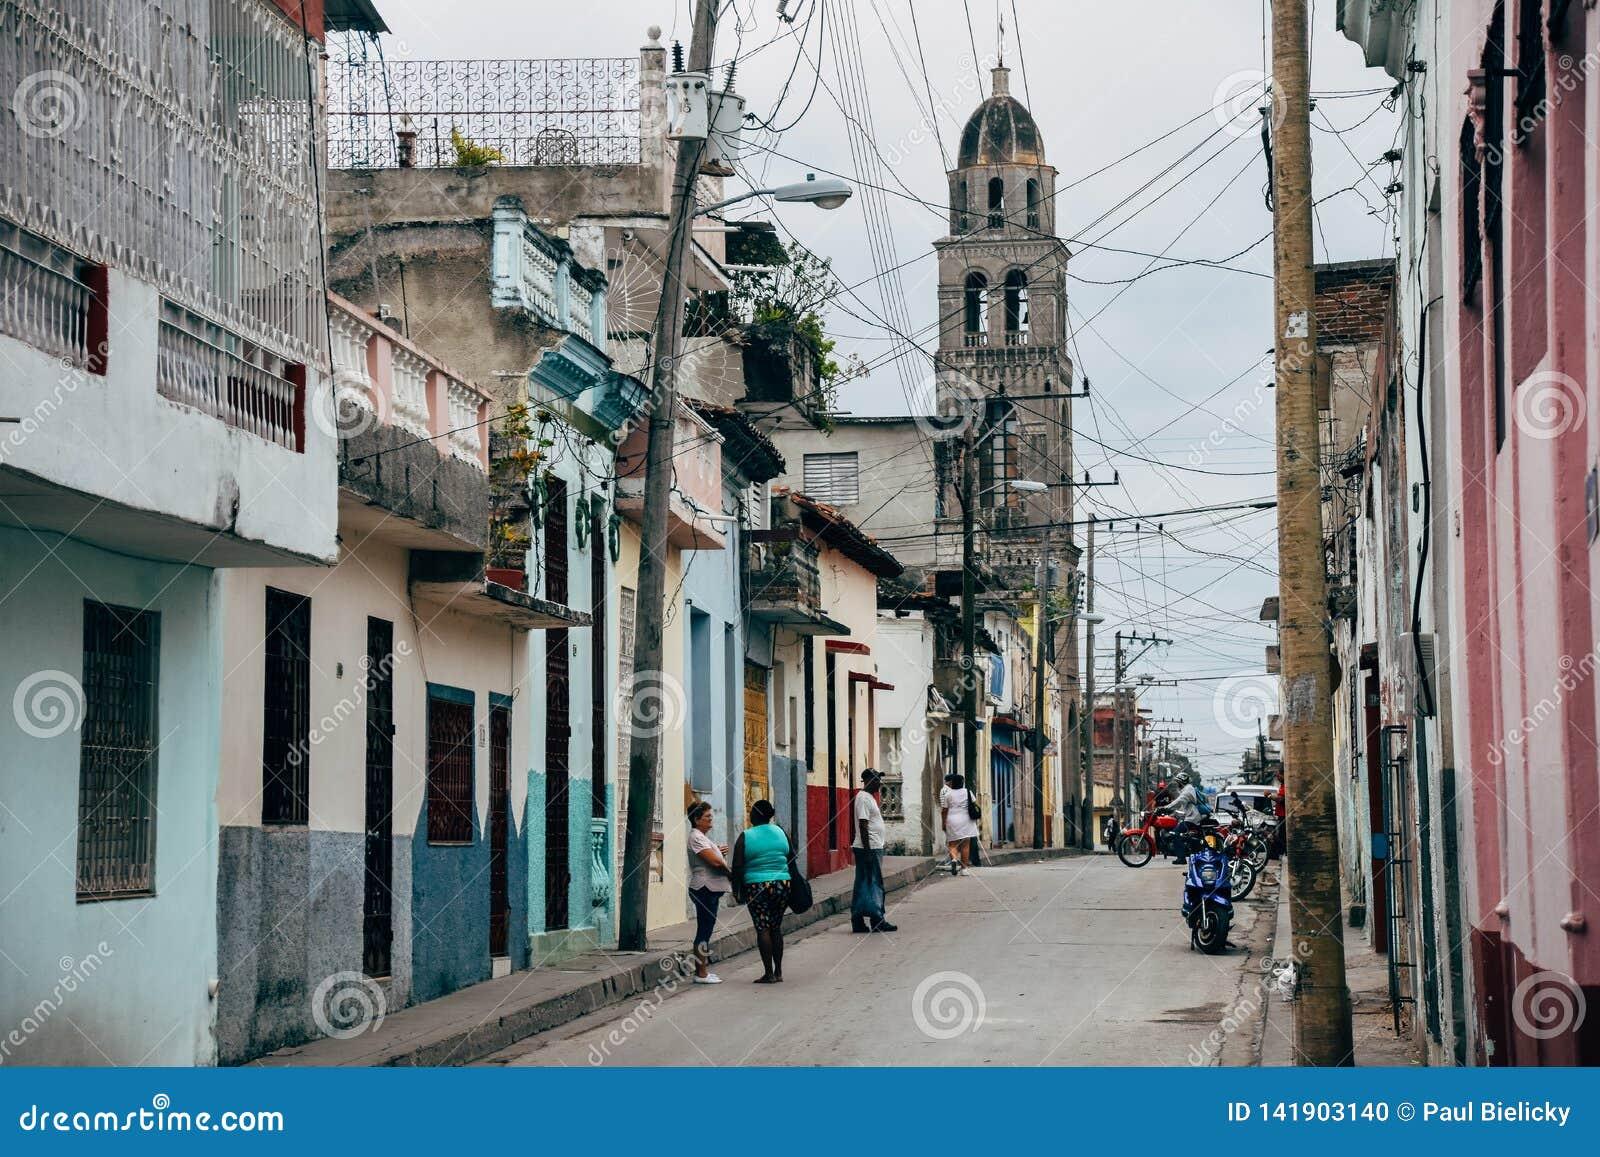 A back street in Santa Clara, Cuba.